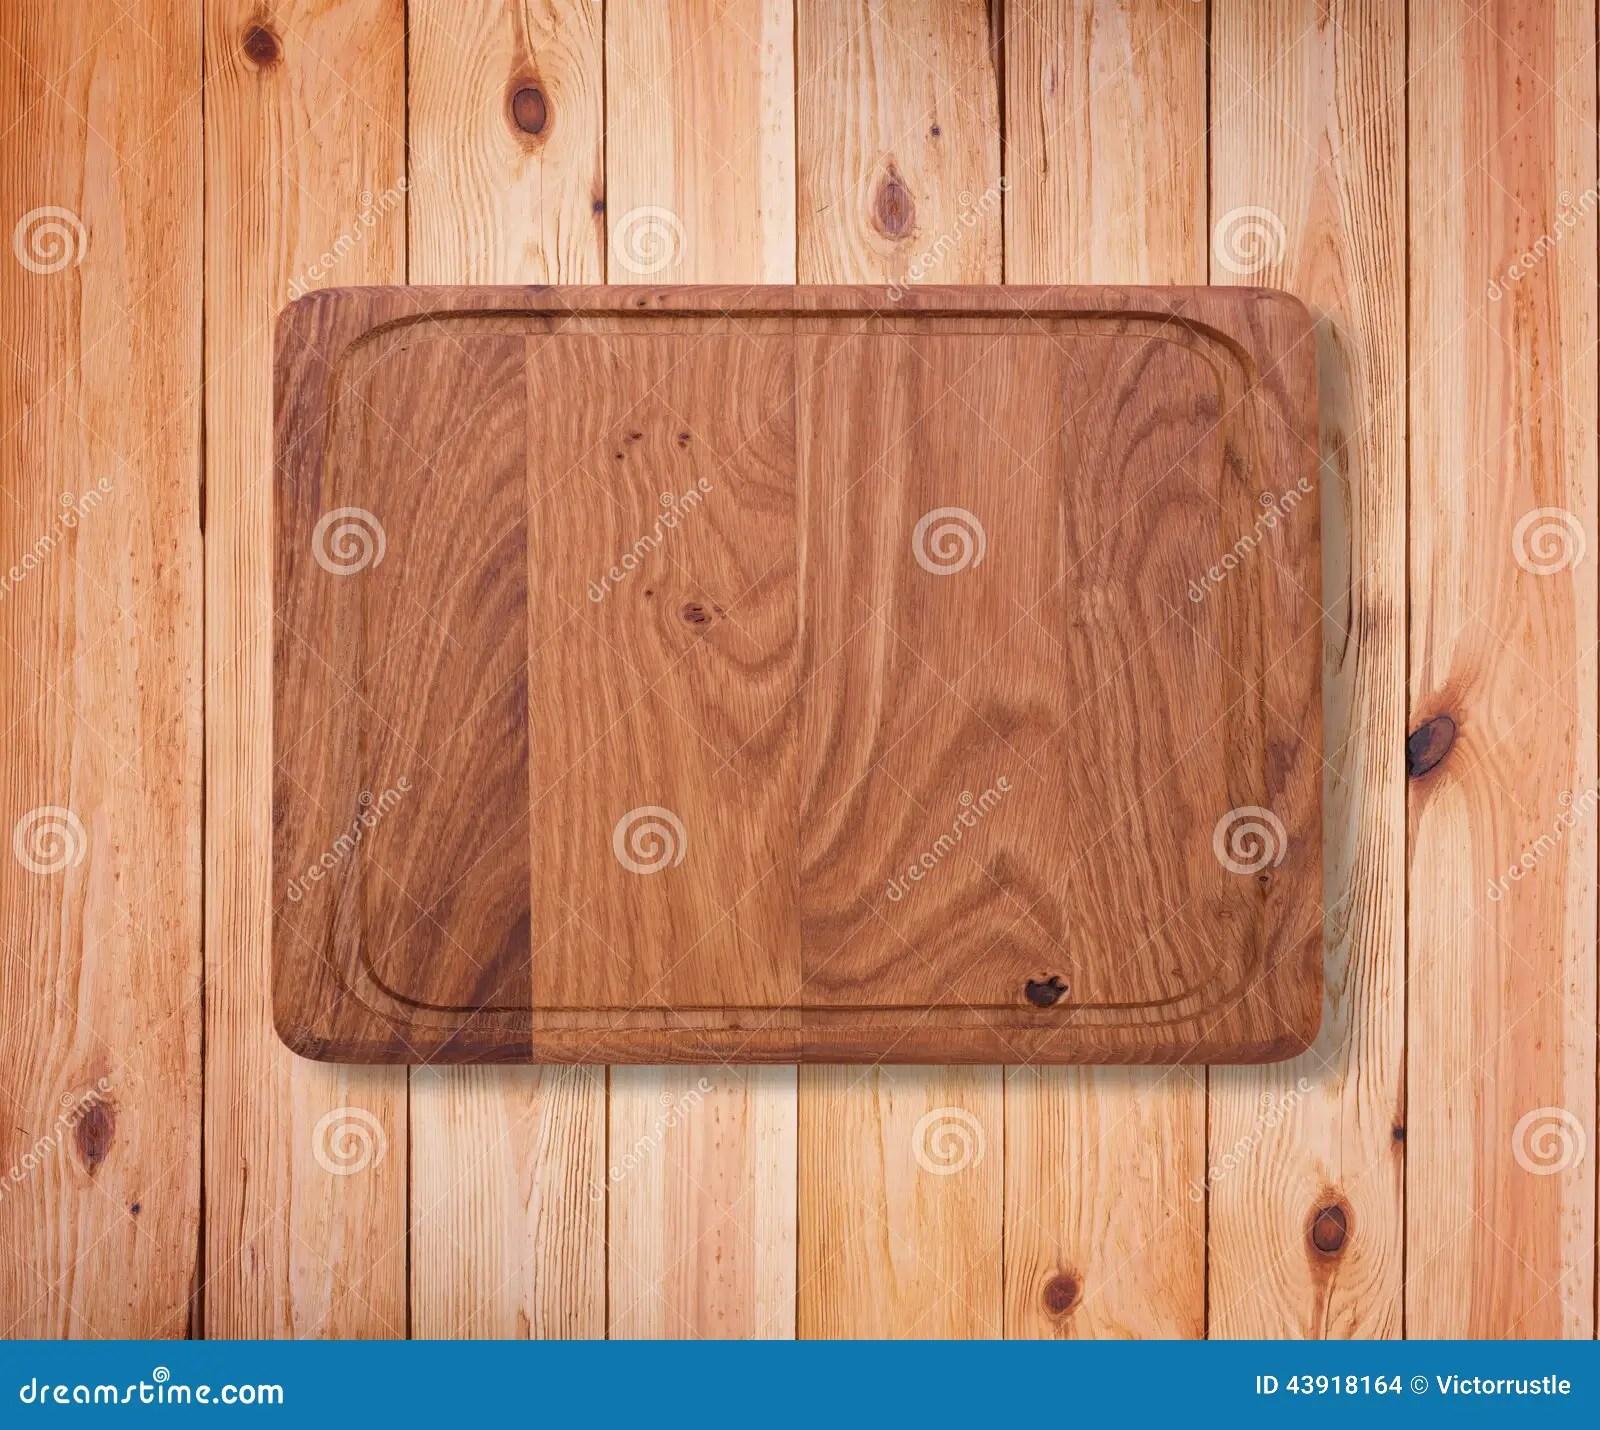 ▻ kitchen table : simplify kitchen cutting table boos block